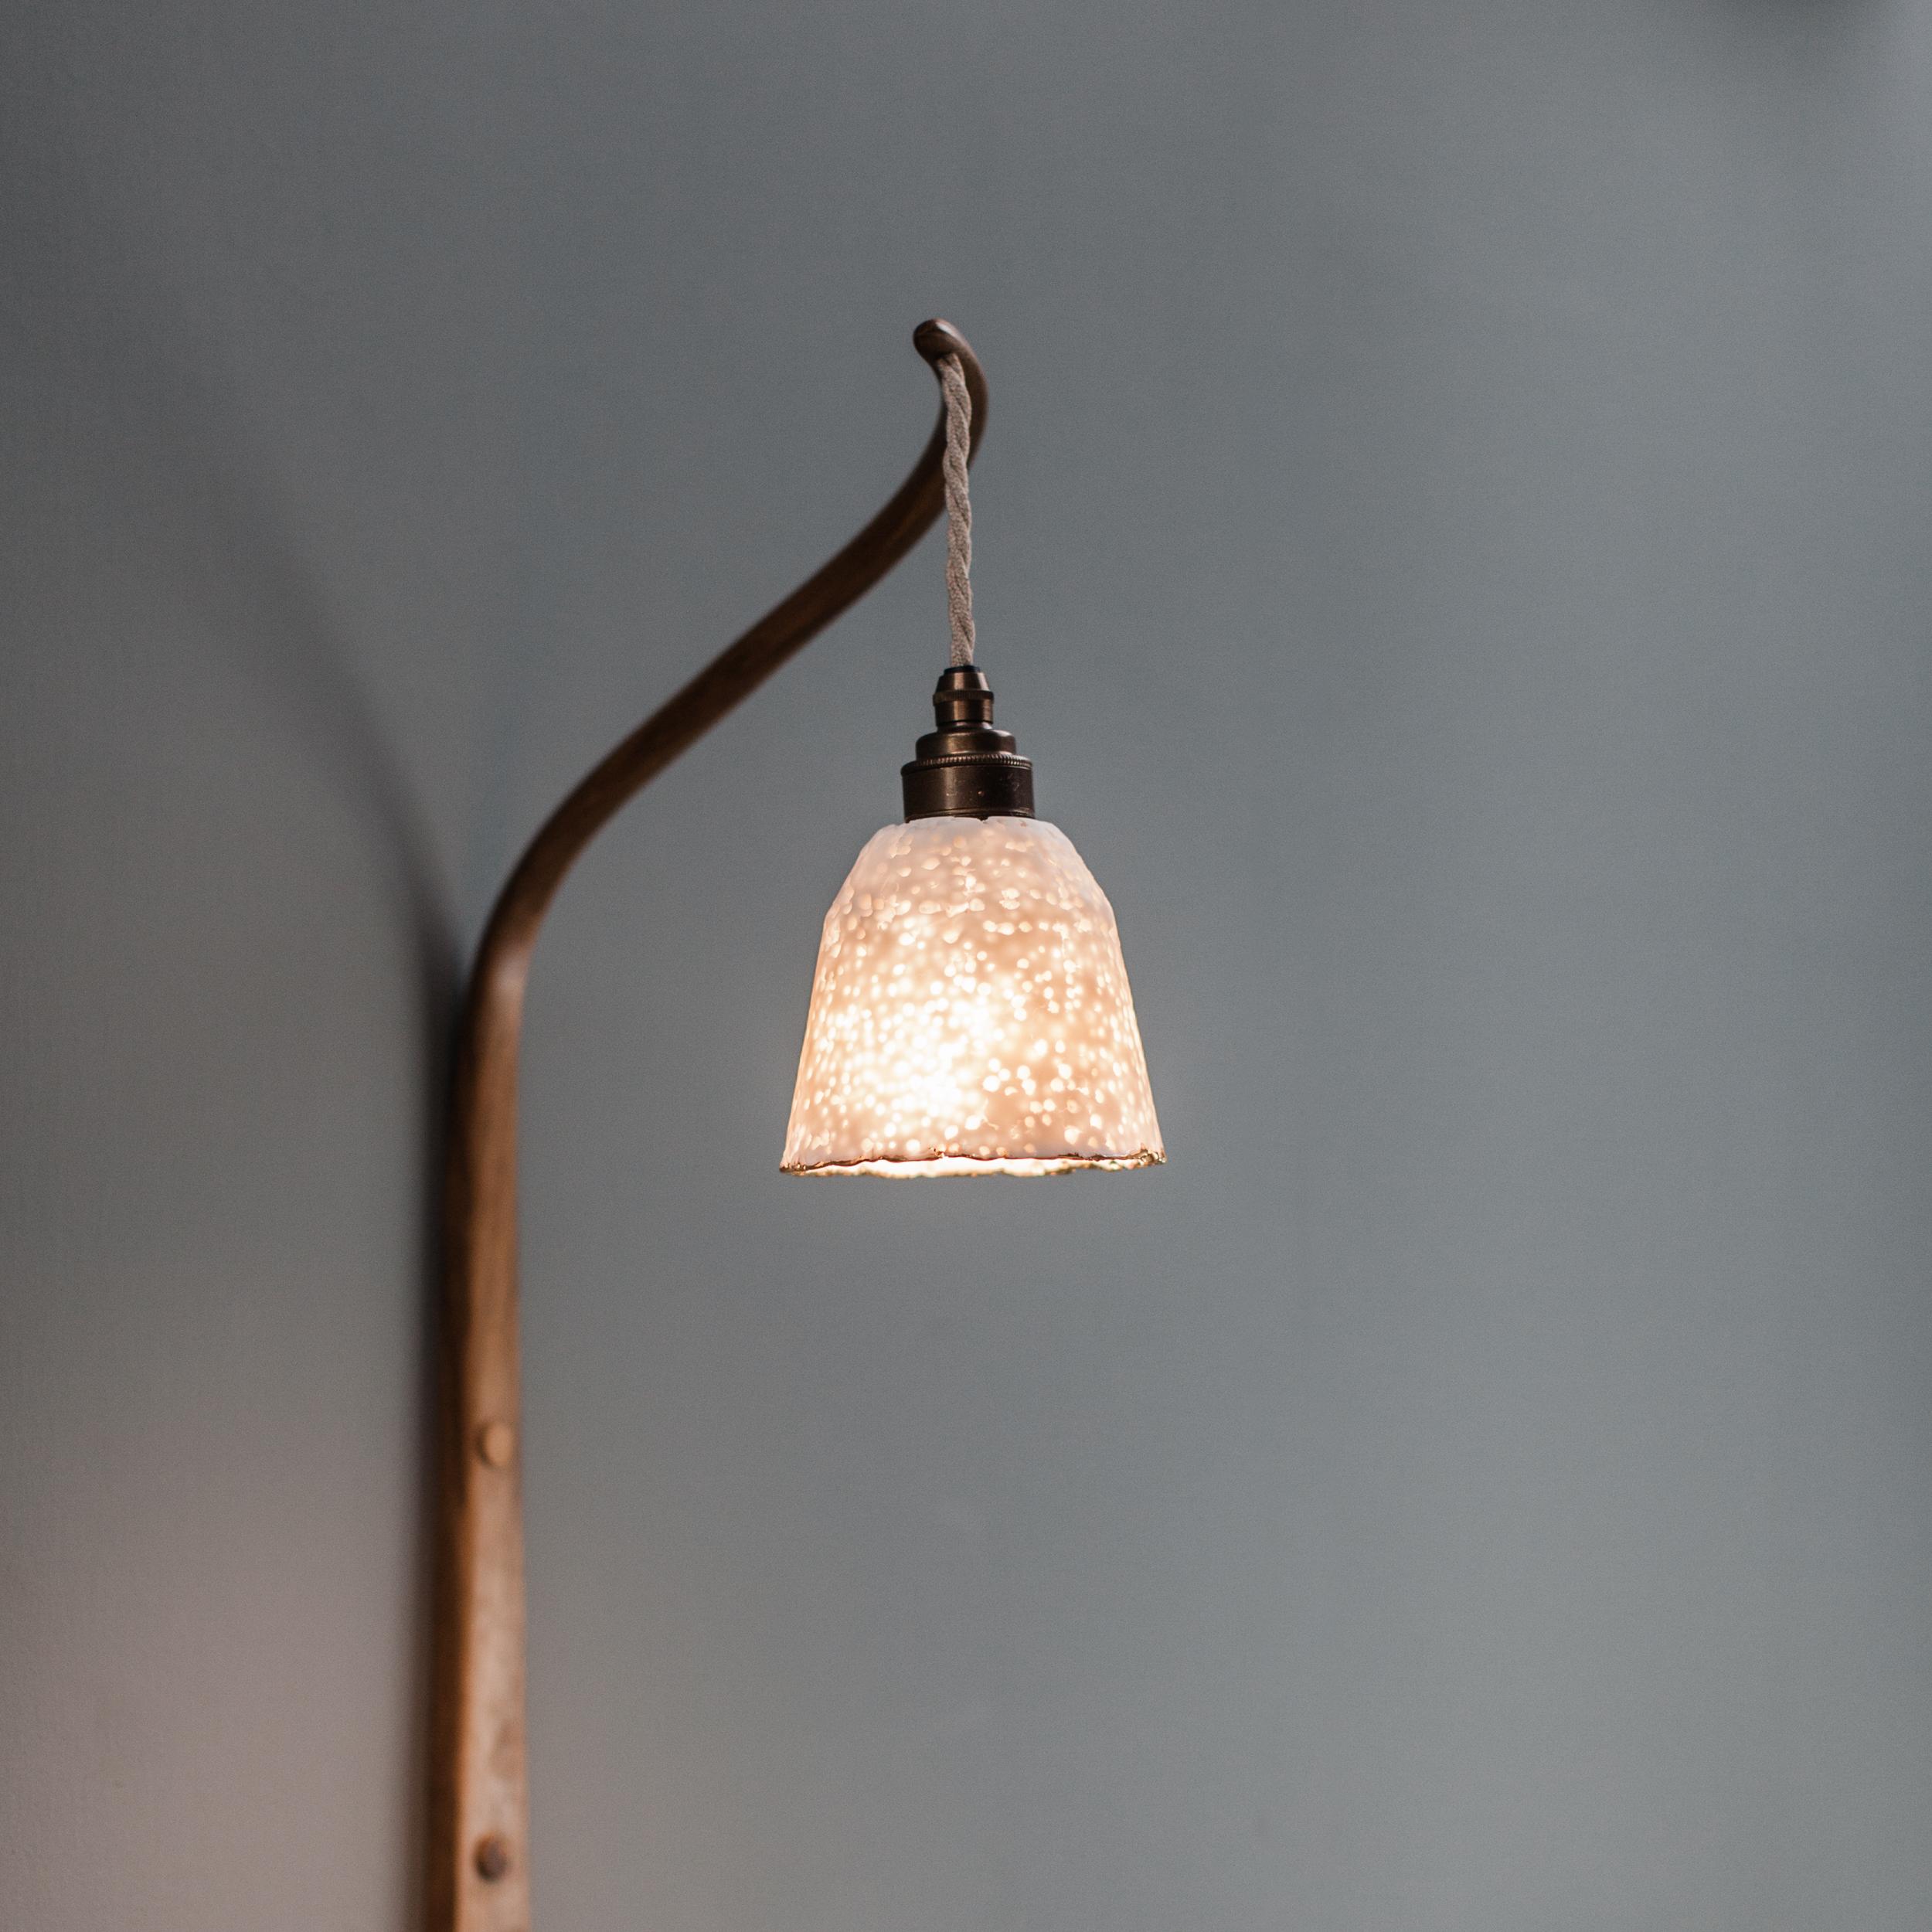 small wall light-15-17WEB SIZE.jpg